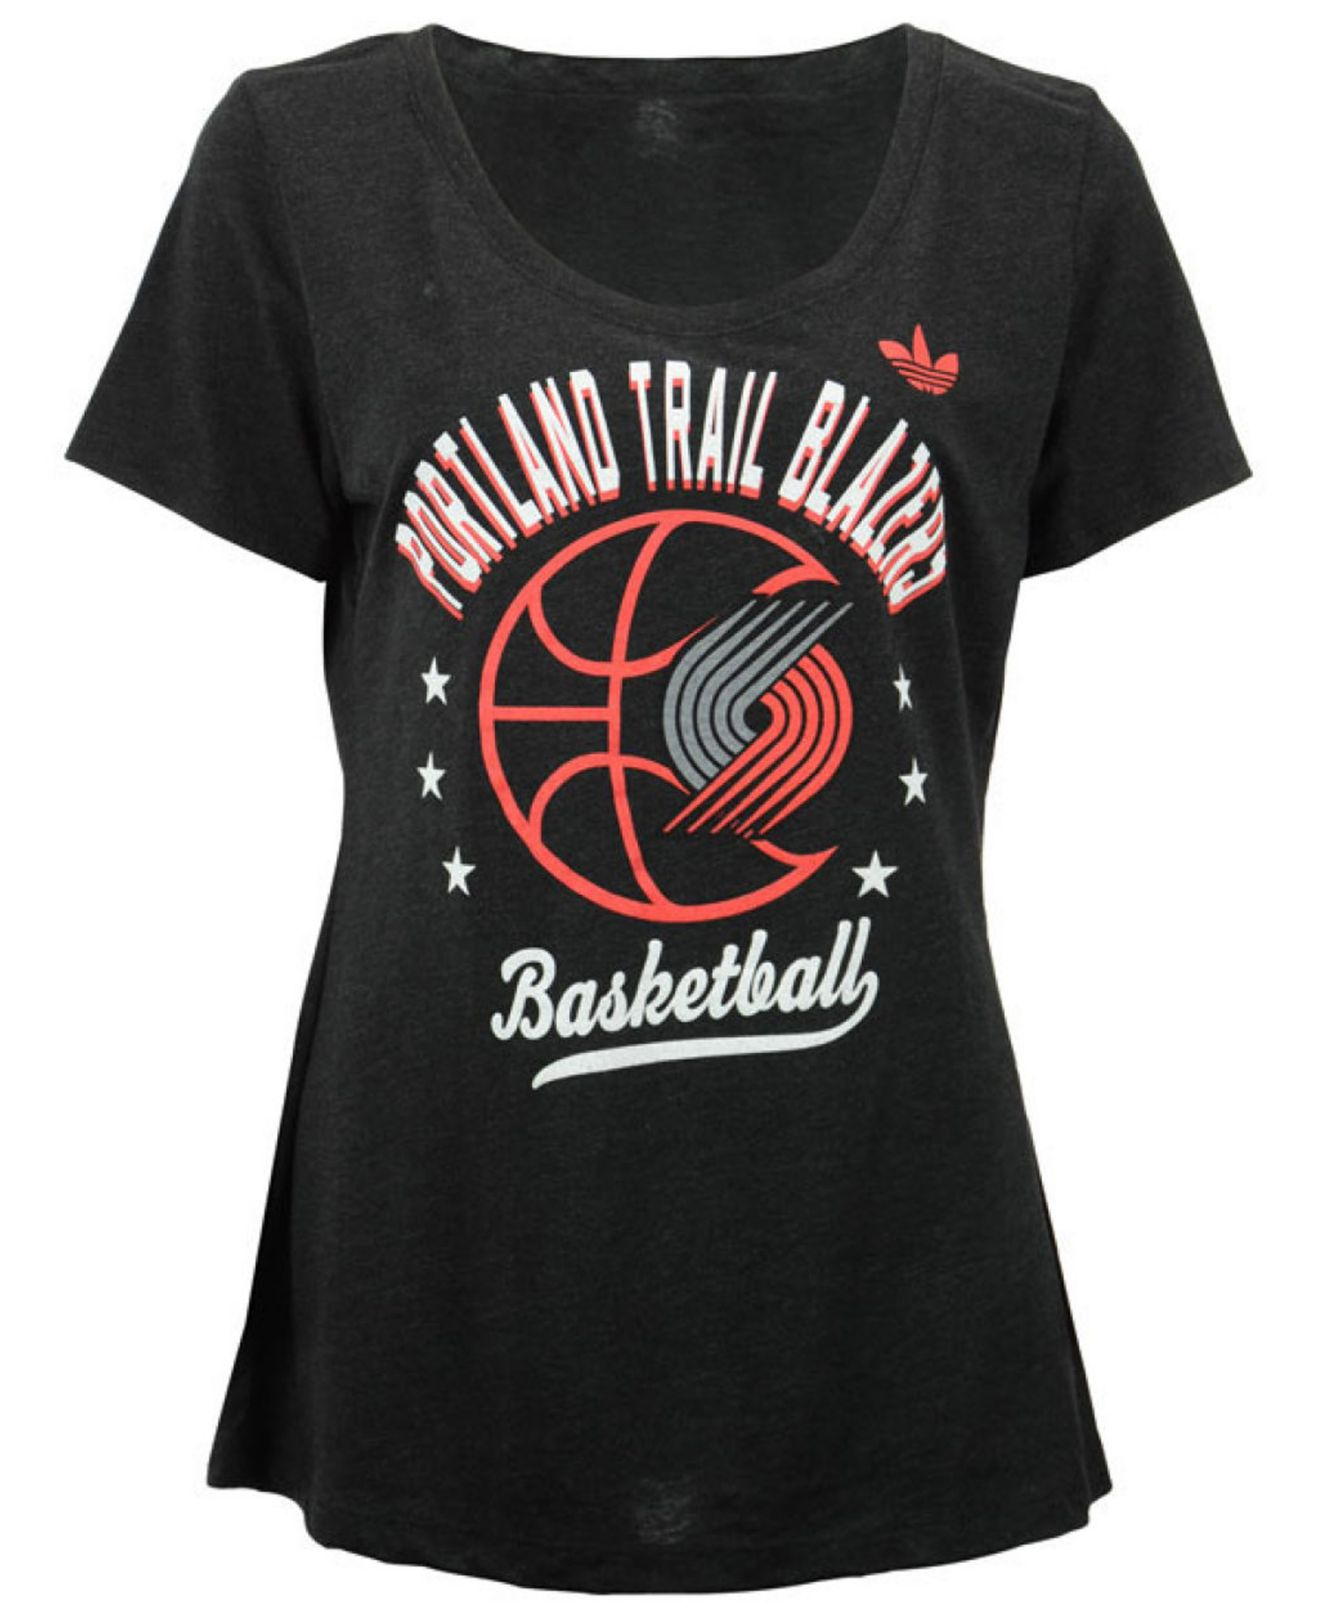 Adidas Originals Women's Portland Trail Blazers